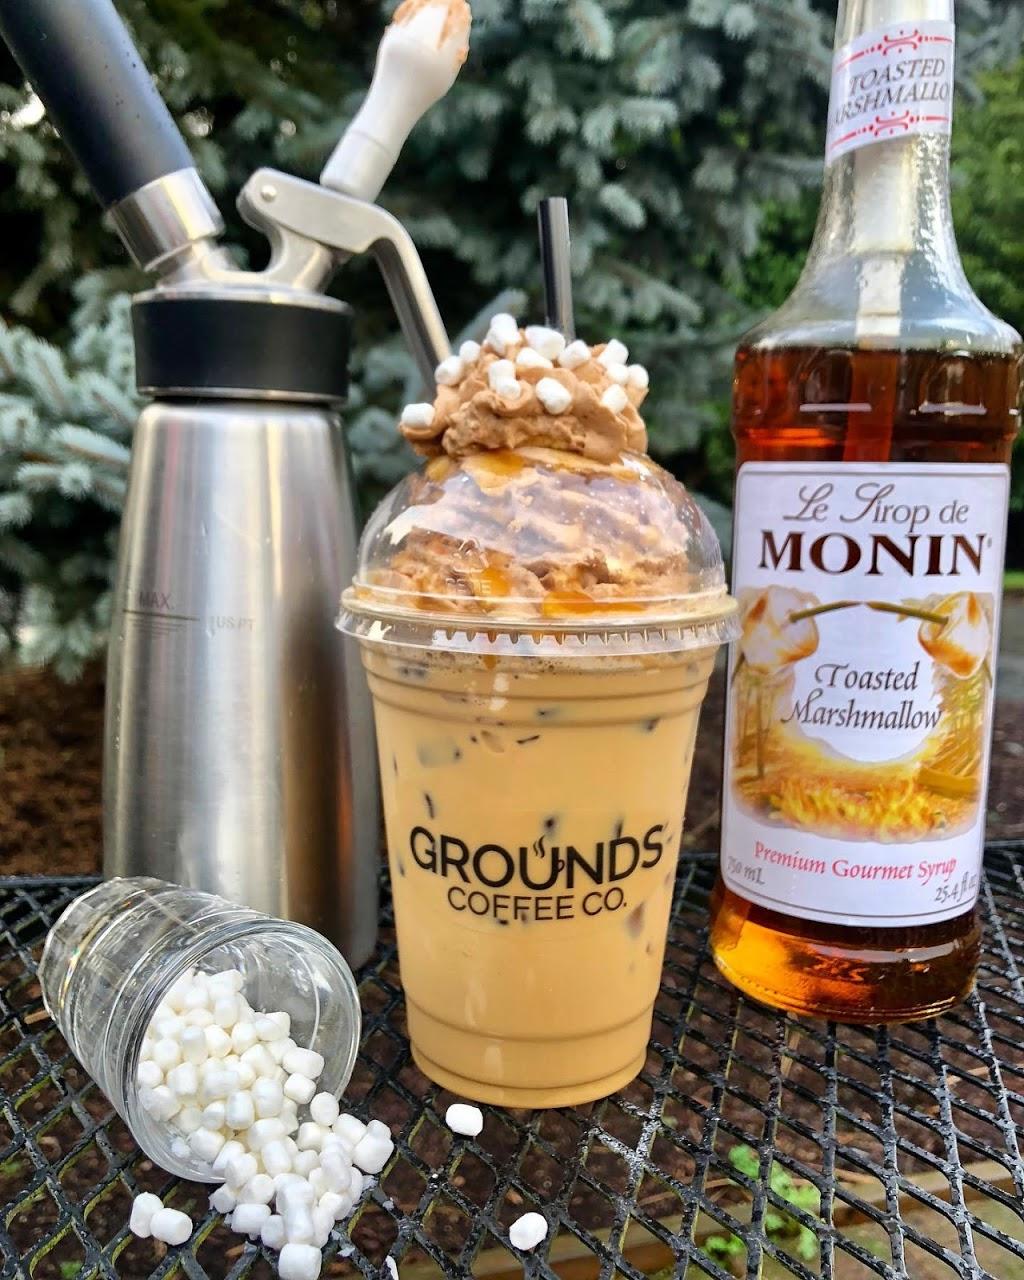 Grounds Coffee Co - cafe  | Photo 2 of 10 | Address: 11601 Harbour Pointe Blvd, Mukilteo, WA 98275, USA | Phone: (425) 290-1643